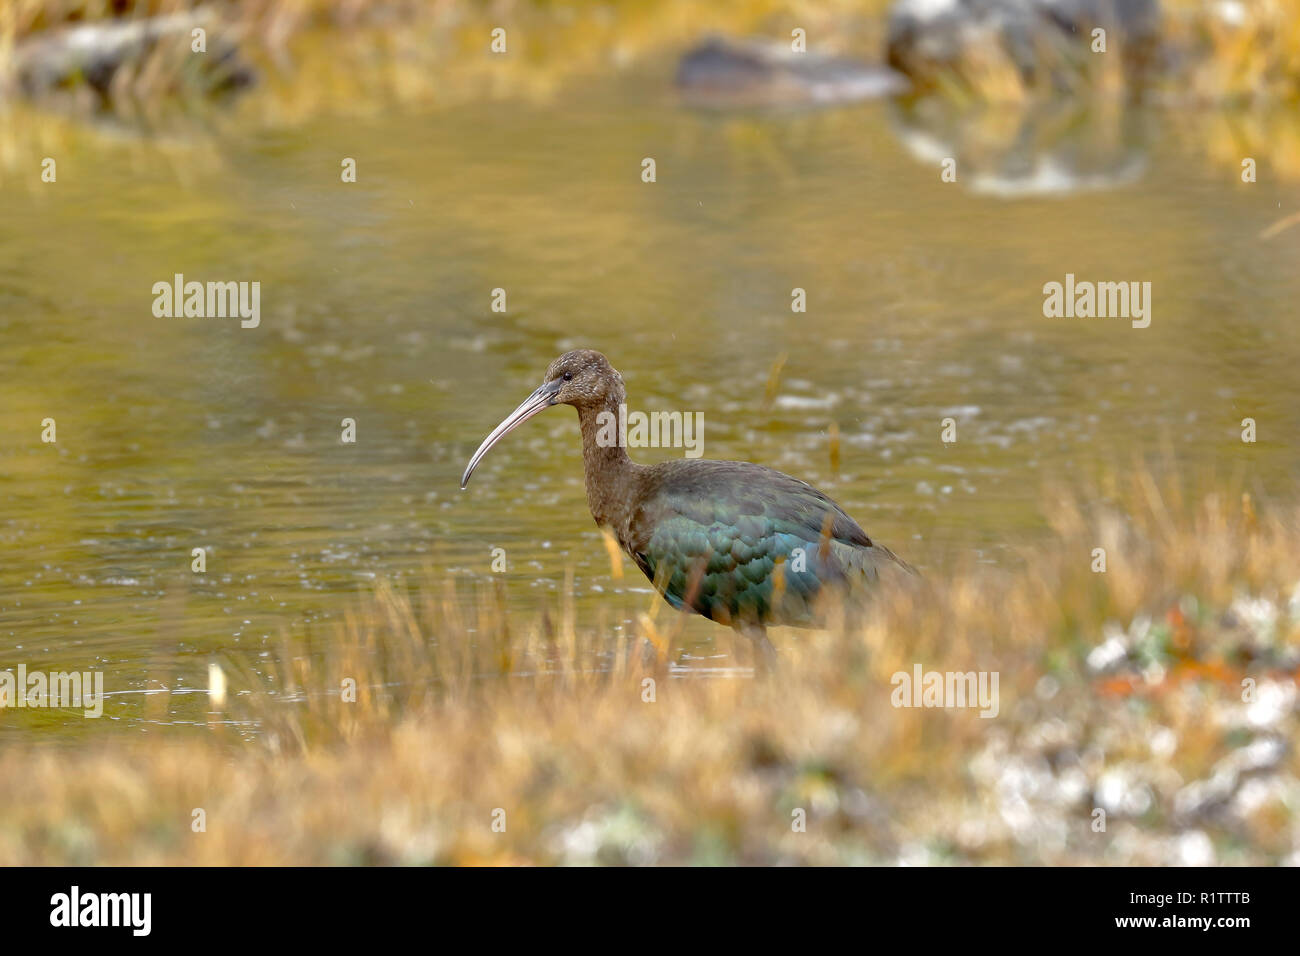 Beautiful specimen of puna ibis (Plegadis ridgwayi) feeding on an Andean lagoon. Huancayo - Peru. - Stock Image